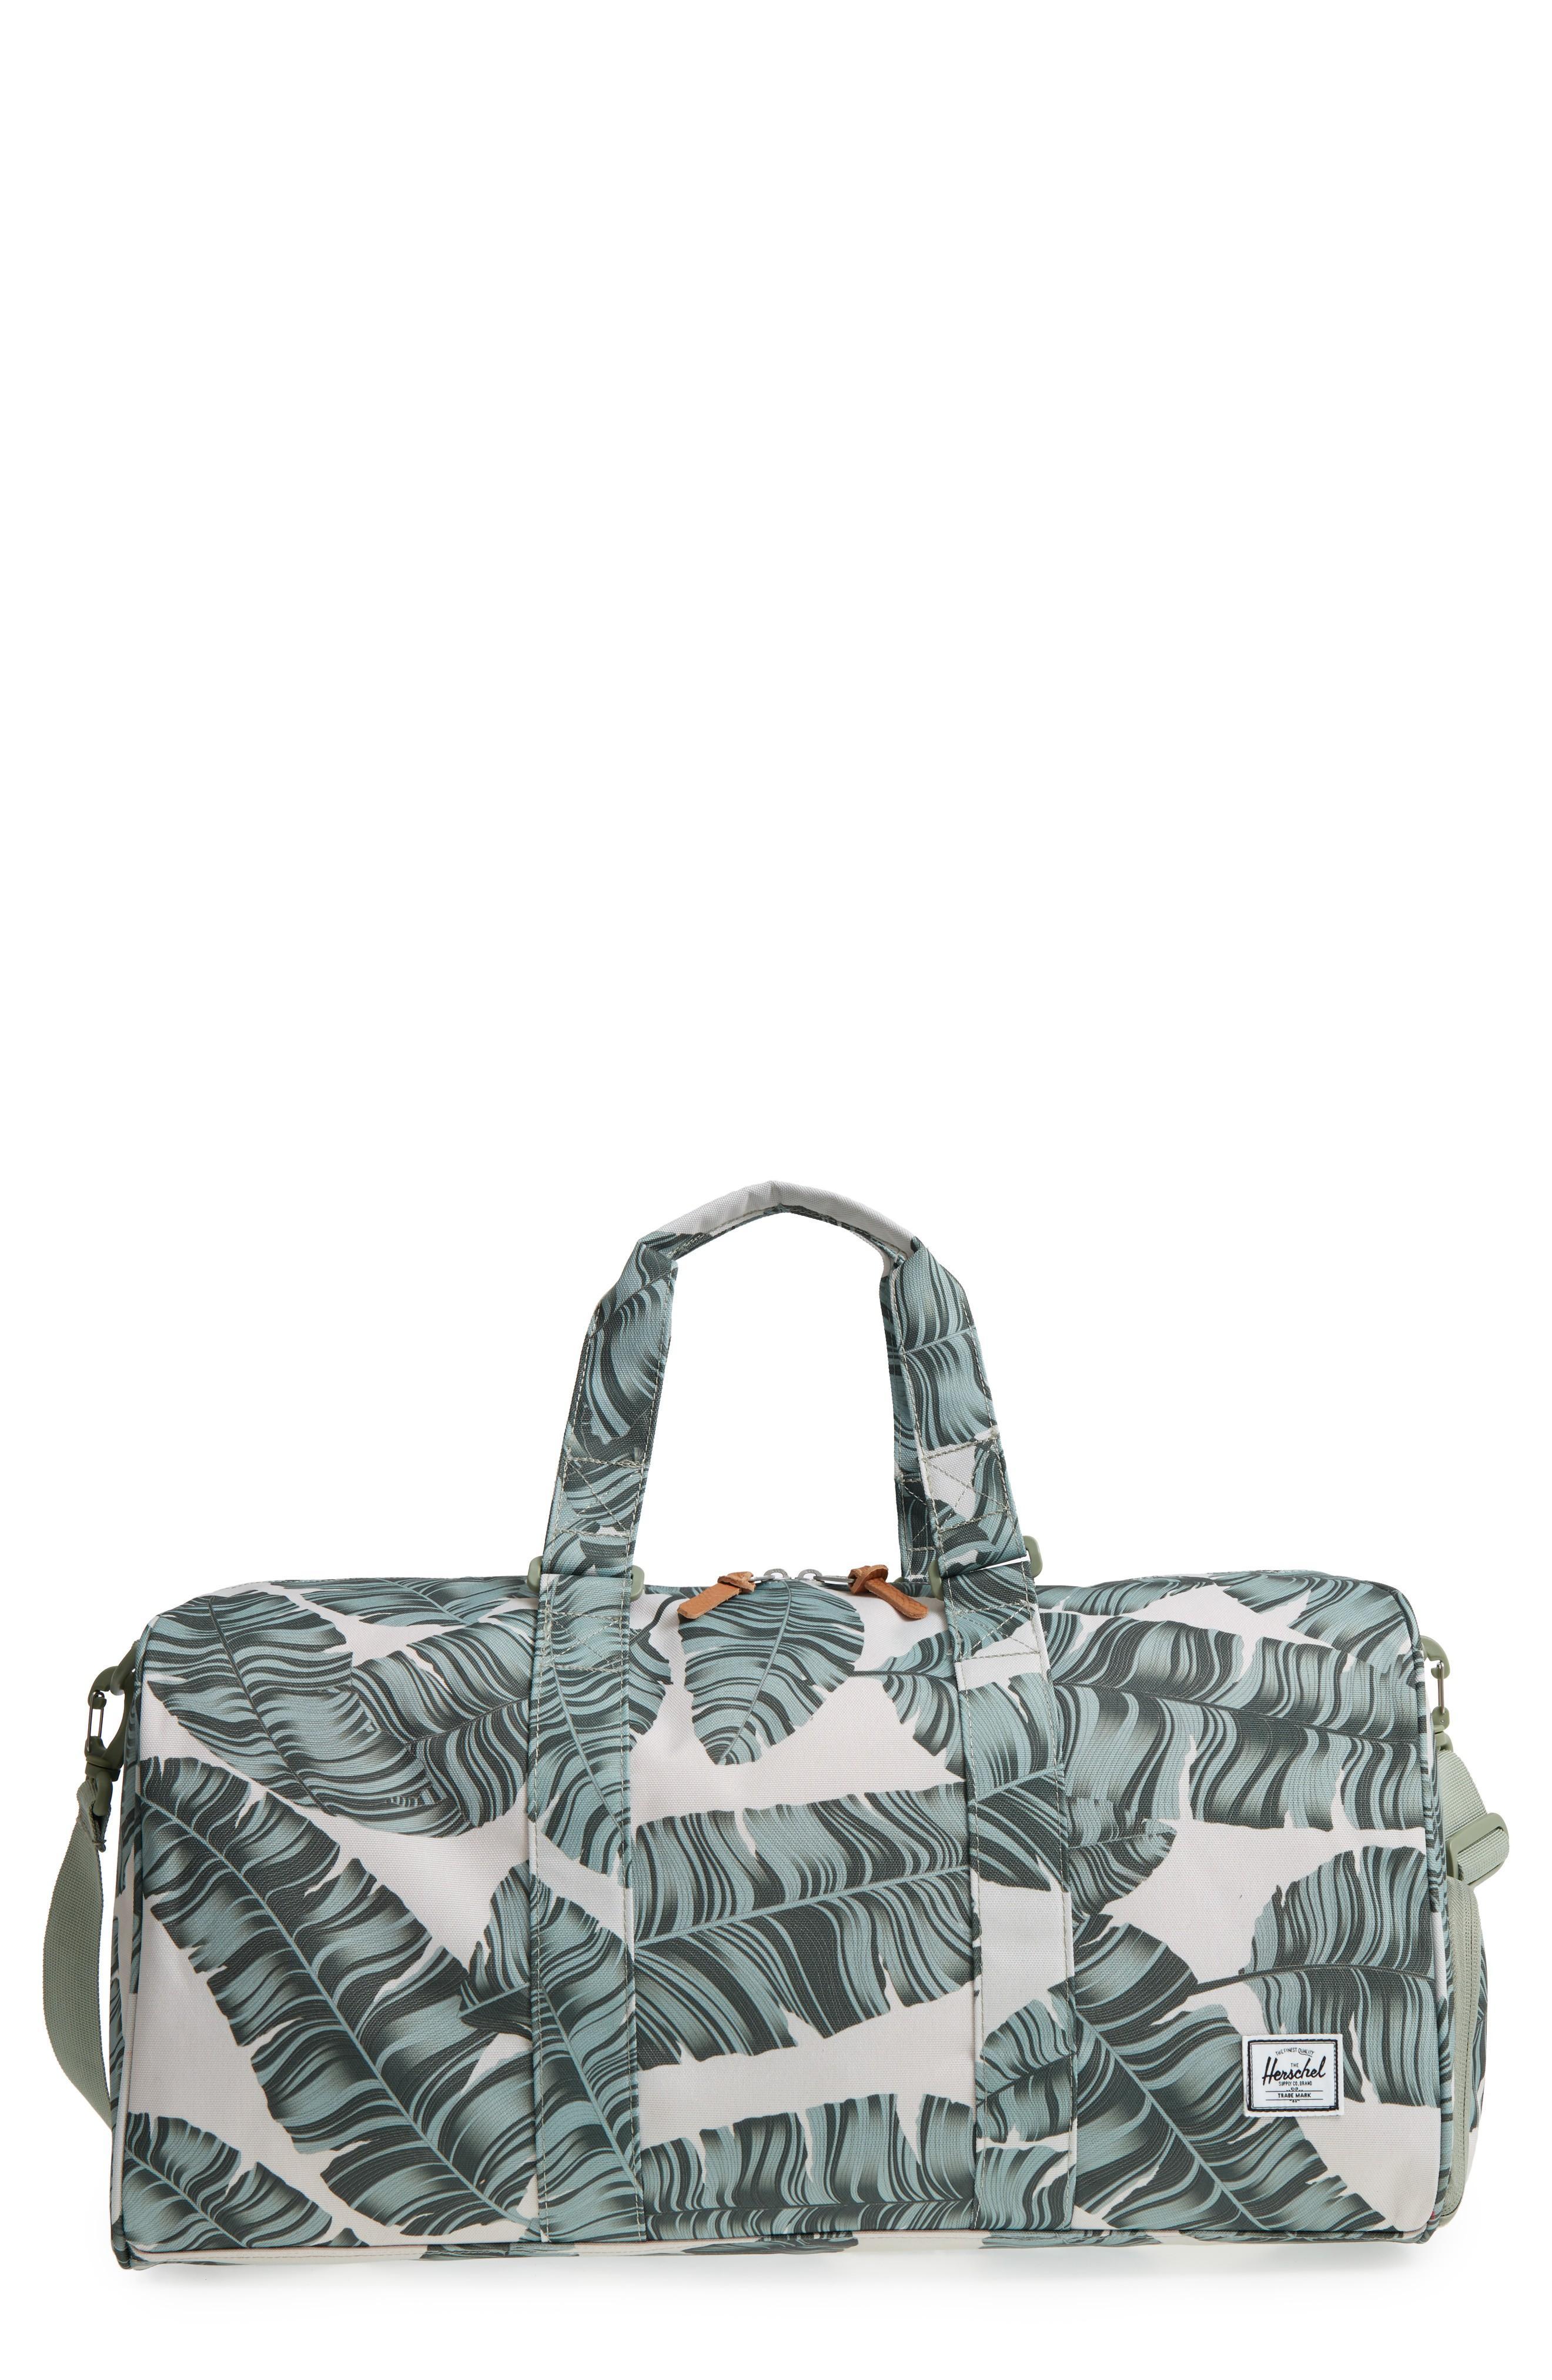 b2028799c11 Herschel Supply Co. Novel Canvas Duffel Bag - Metallic In Silver Birch Palm